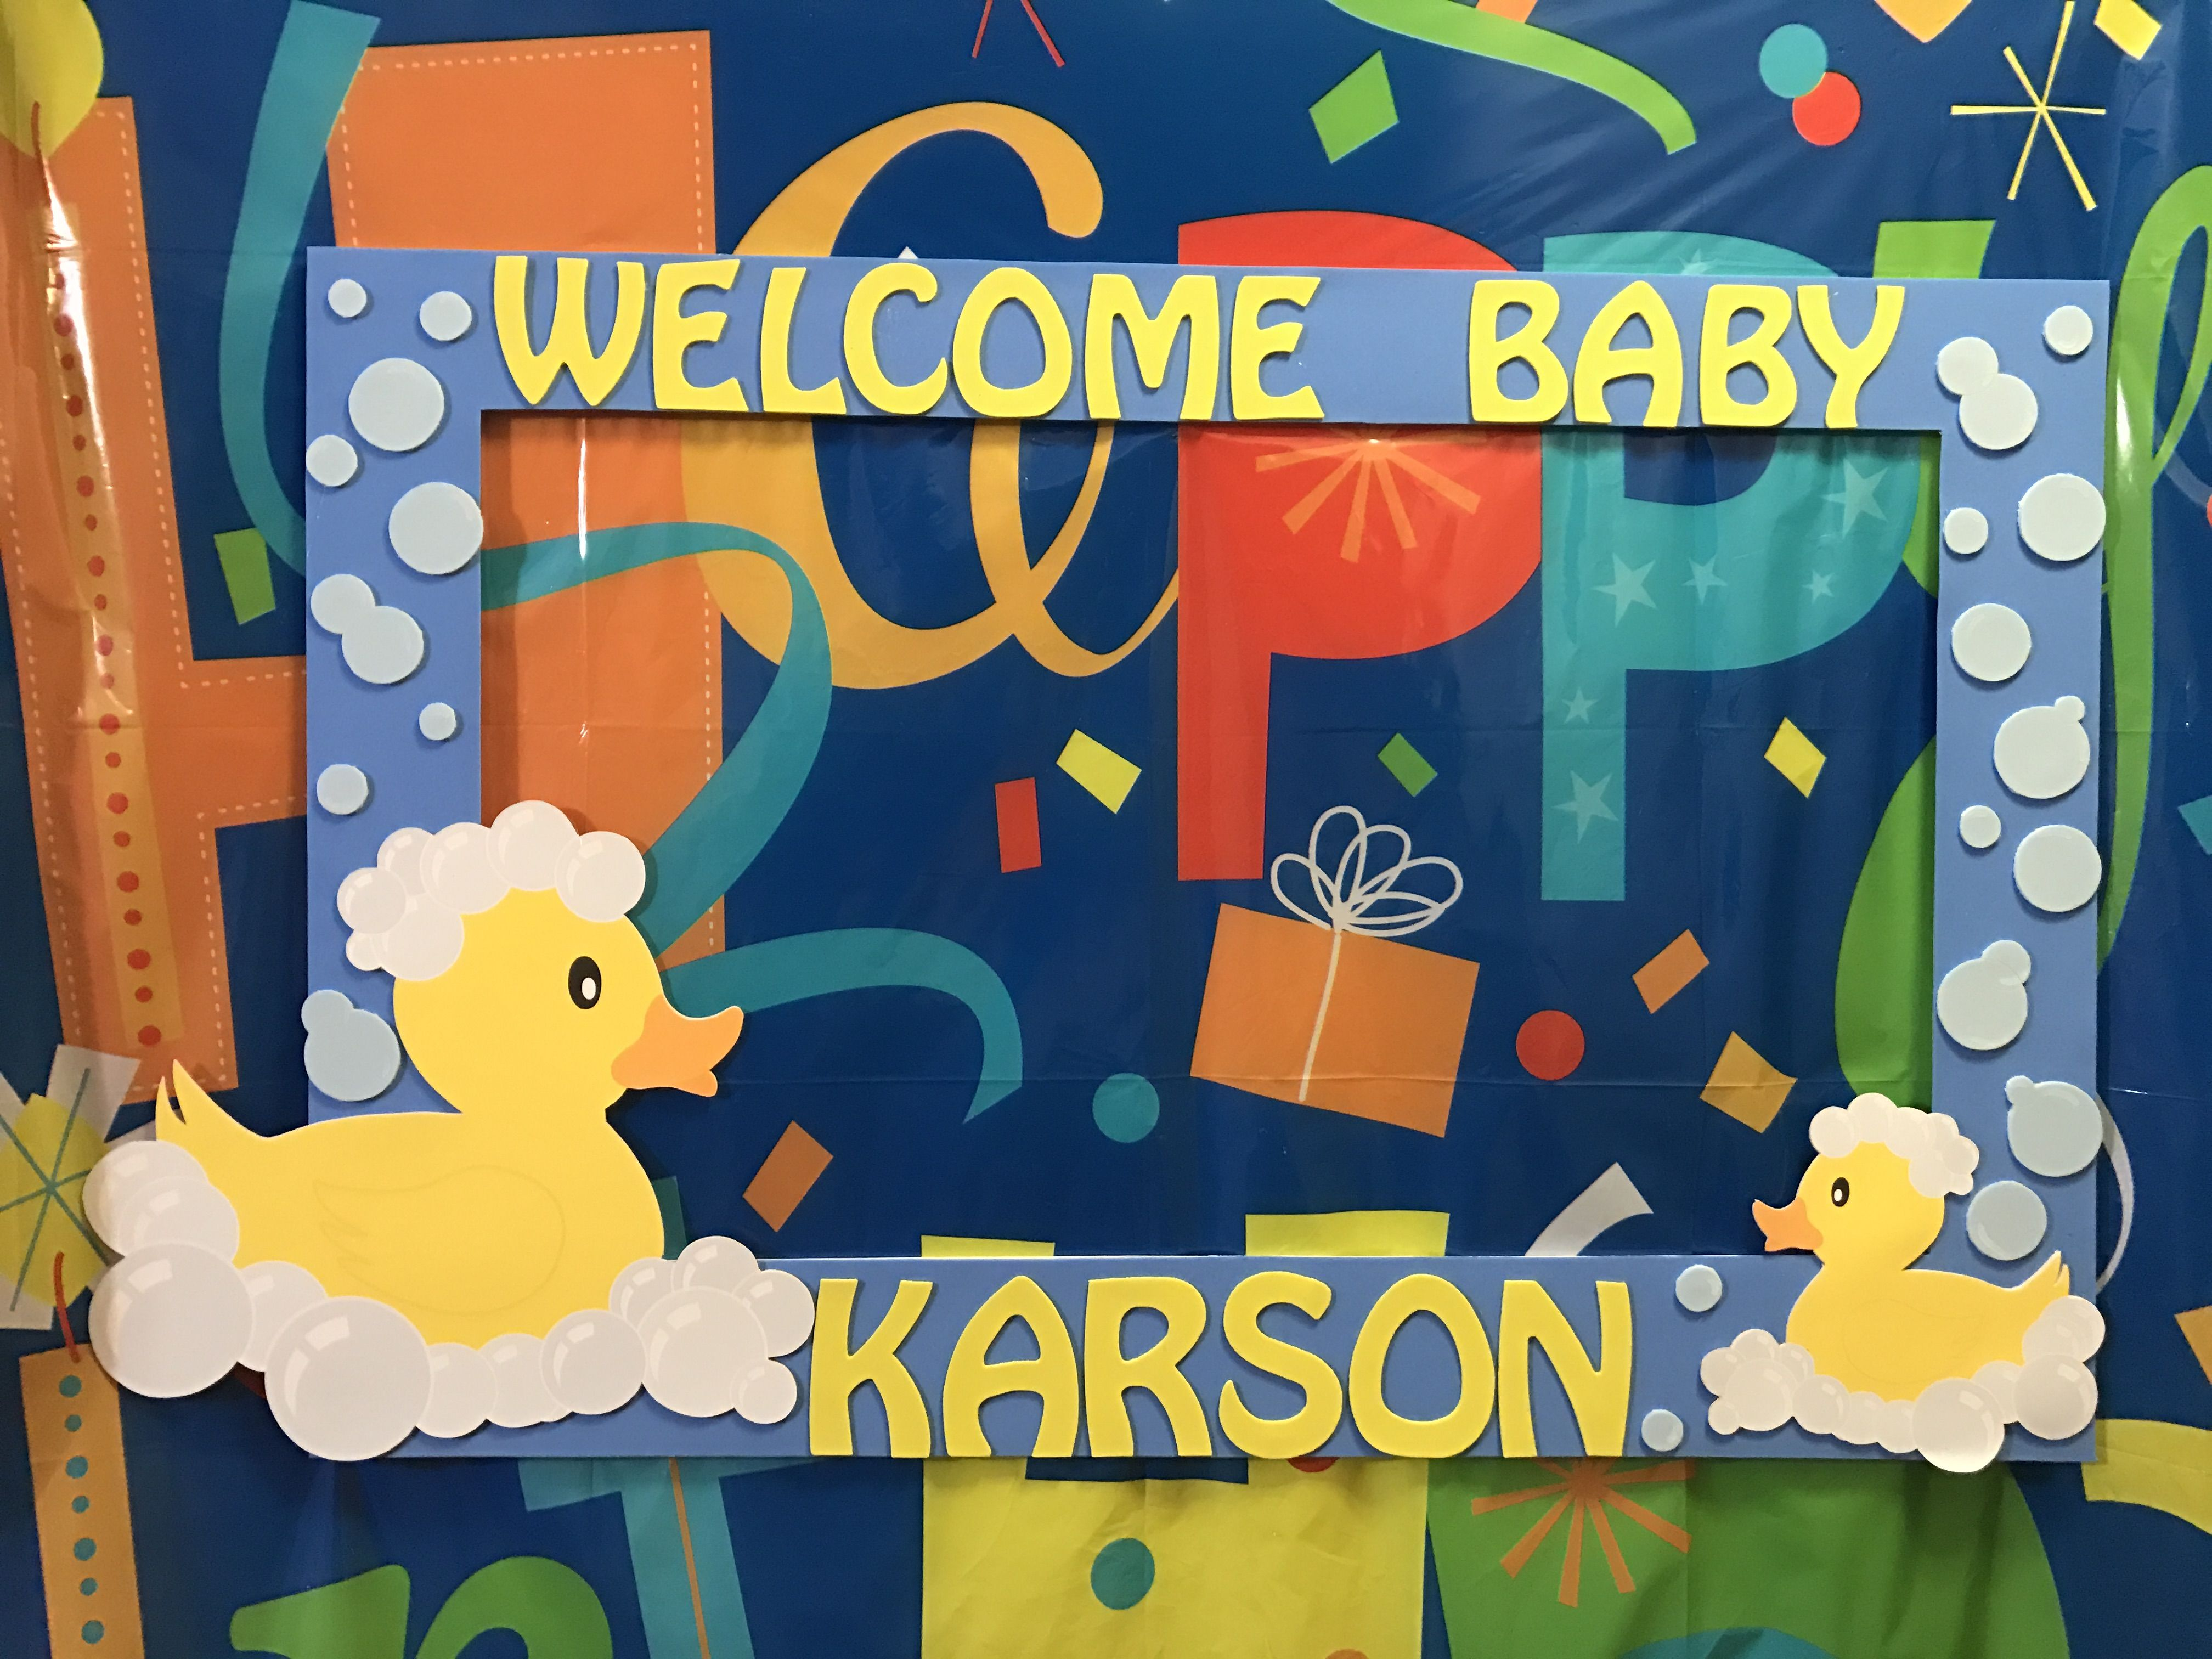 Rubber duck baby shower frame